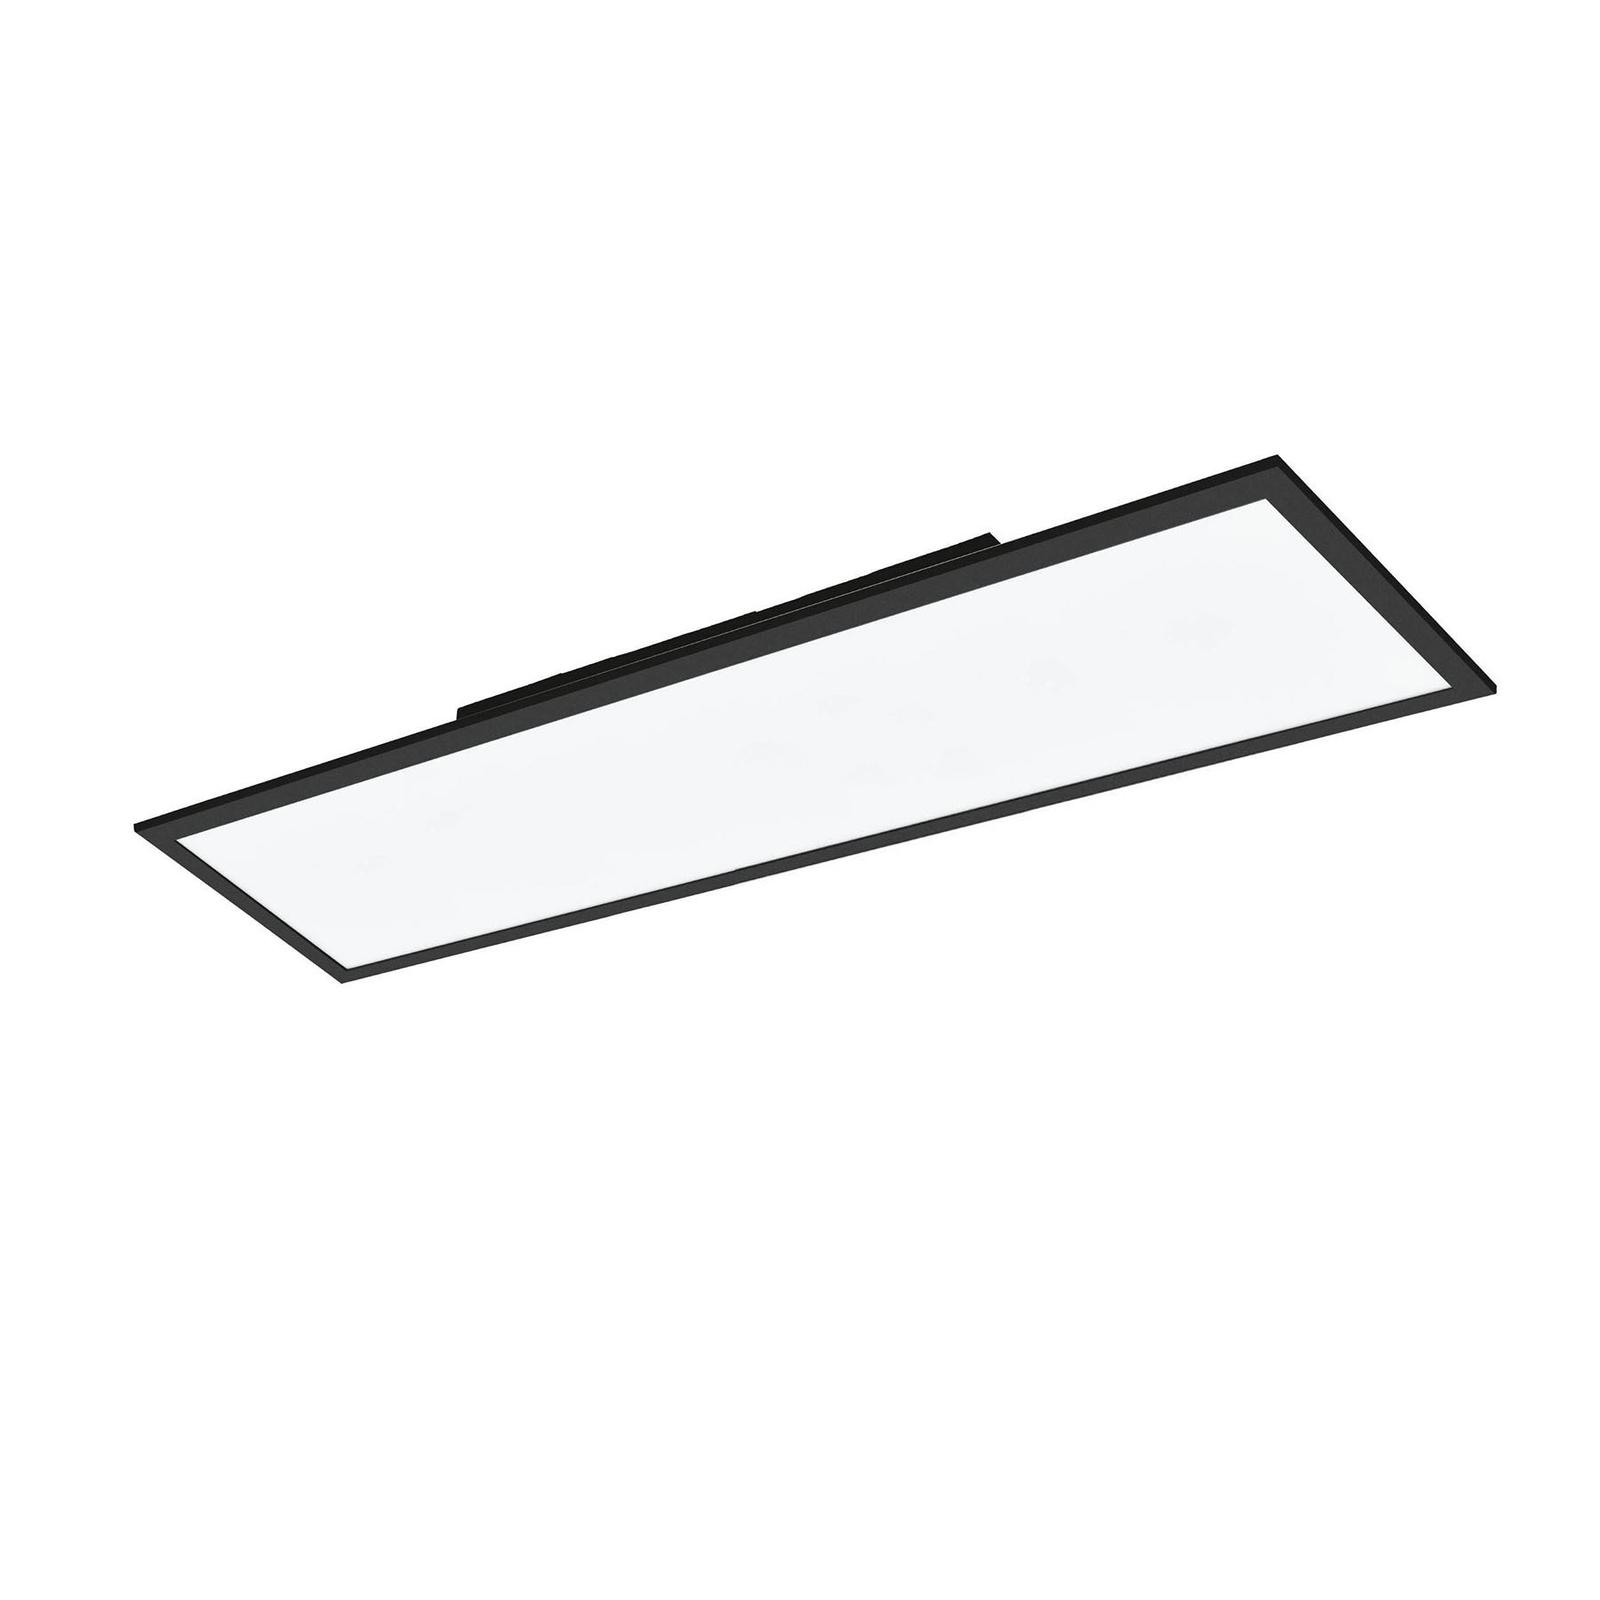 EGLO connect Salobrena-C LED-panel svart 120x30 cm